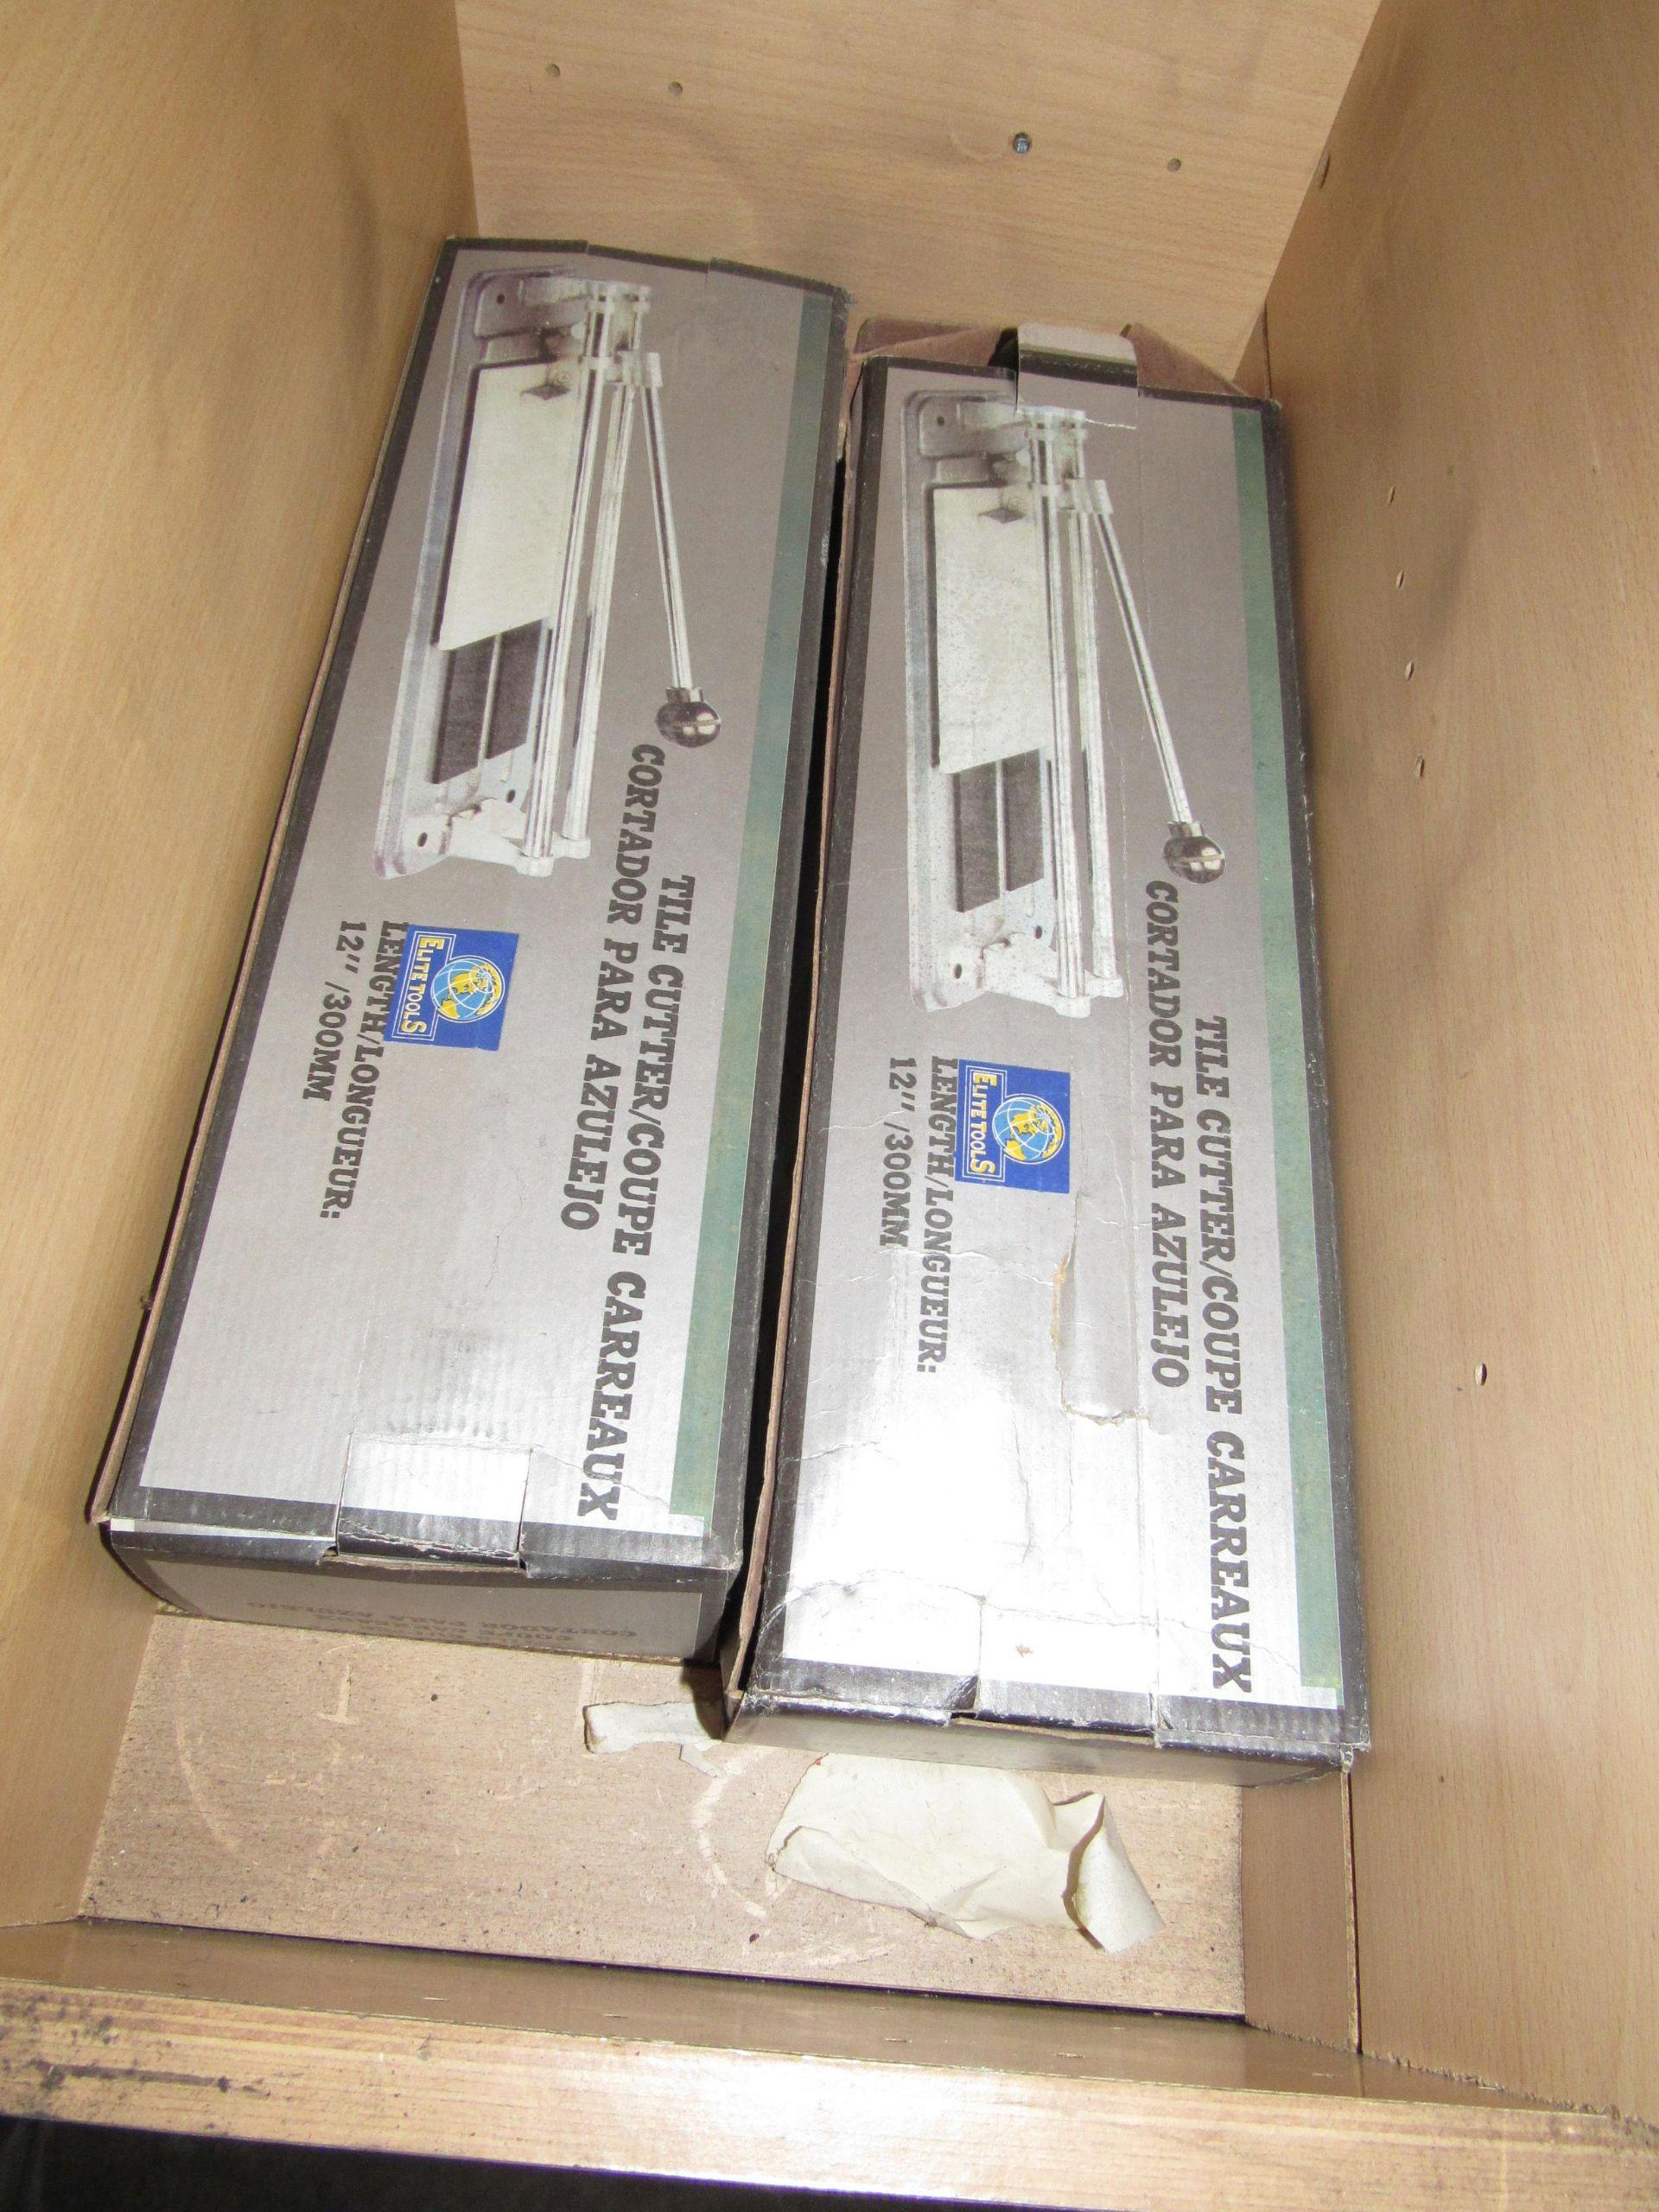 Lot 49 - 2 907 - 300mm Tile Cutting Machine